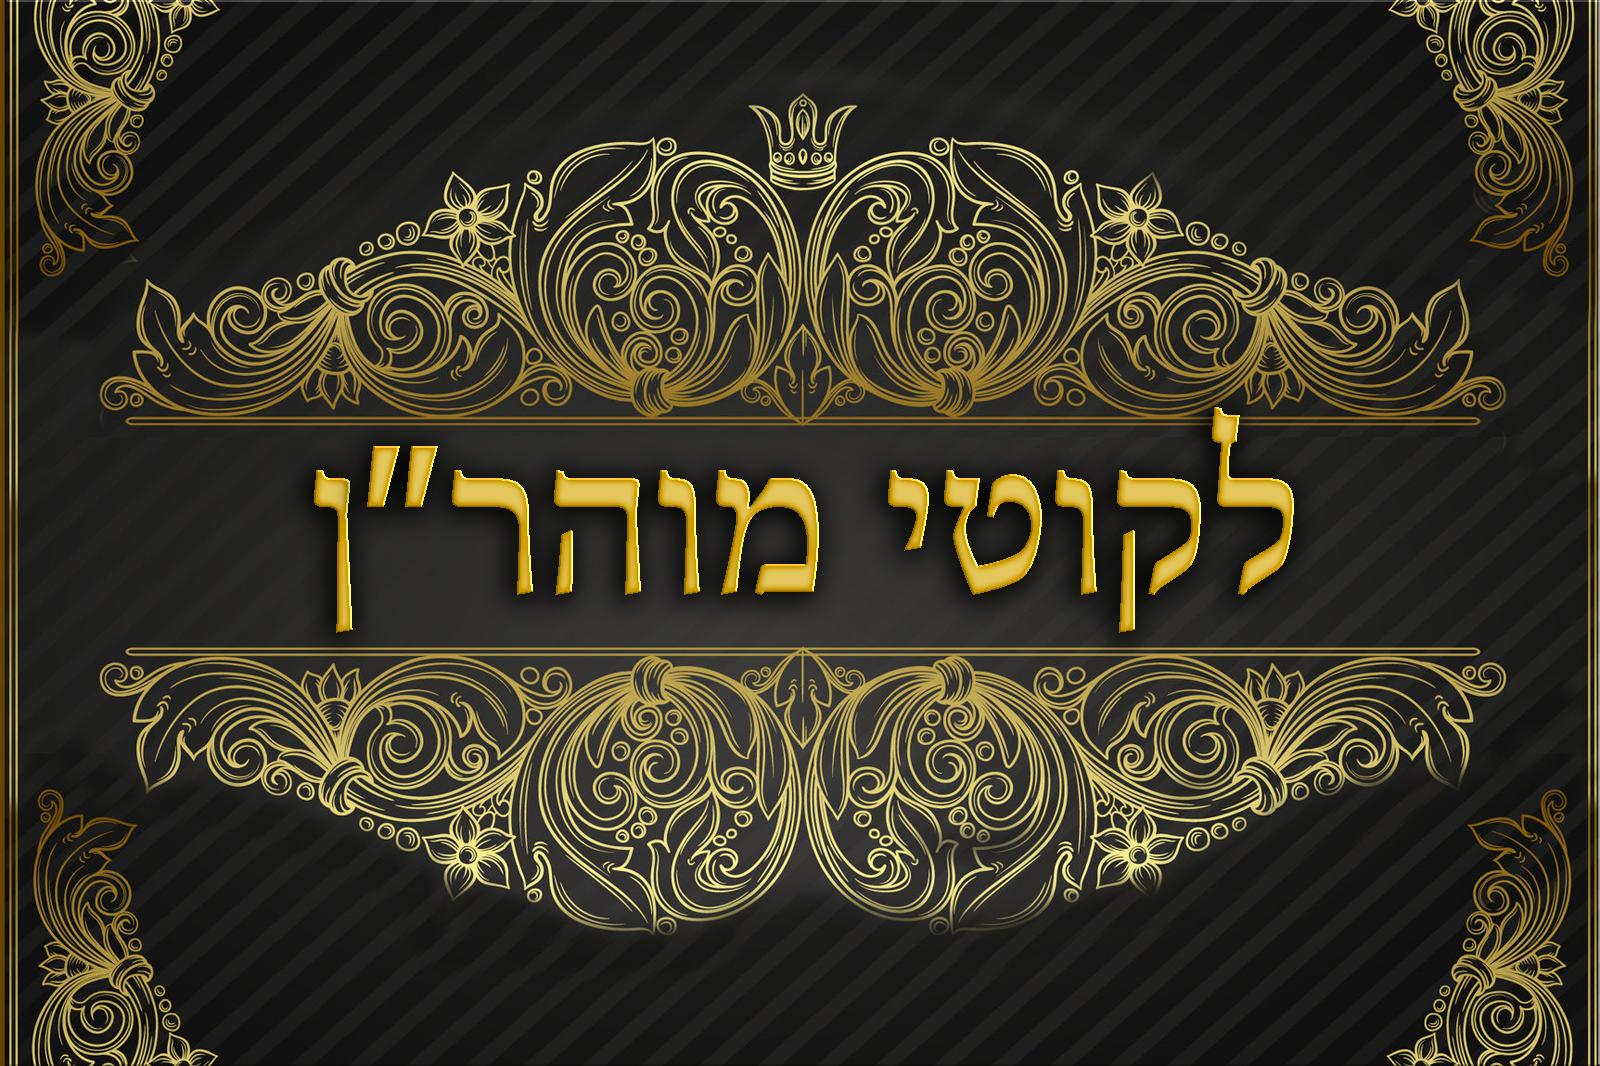 Rabbi Rosenfeld - Likutey Moharan